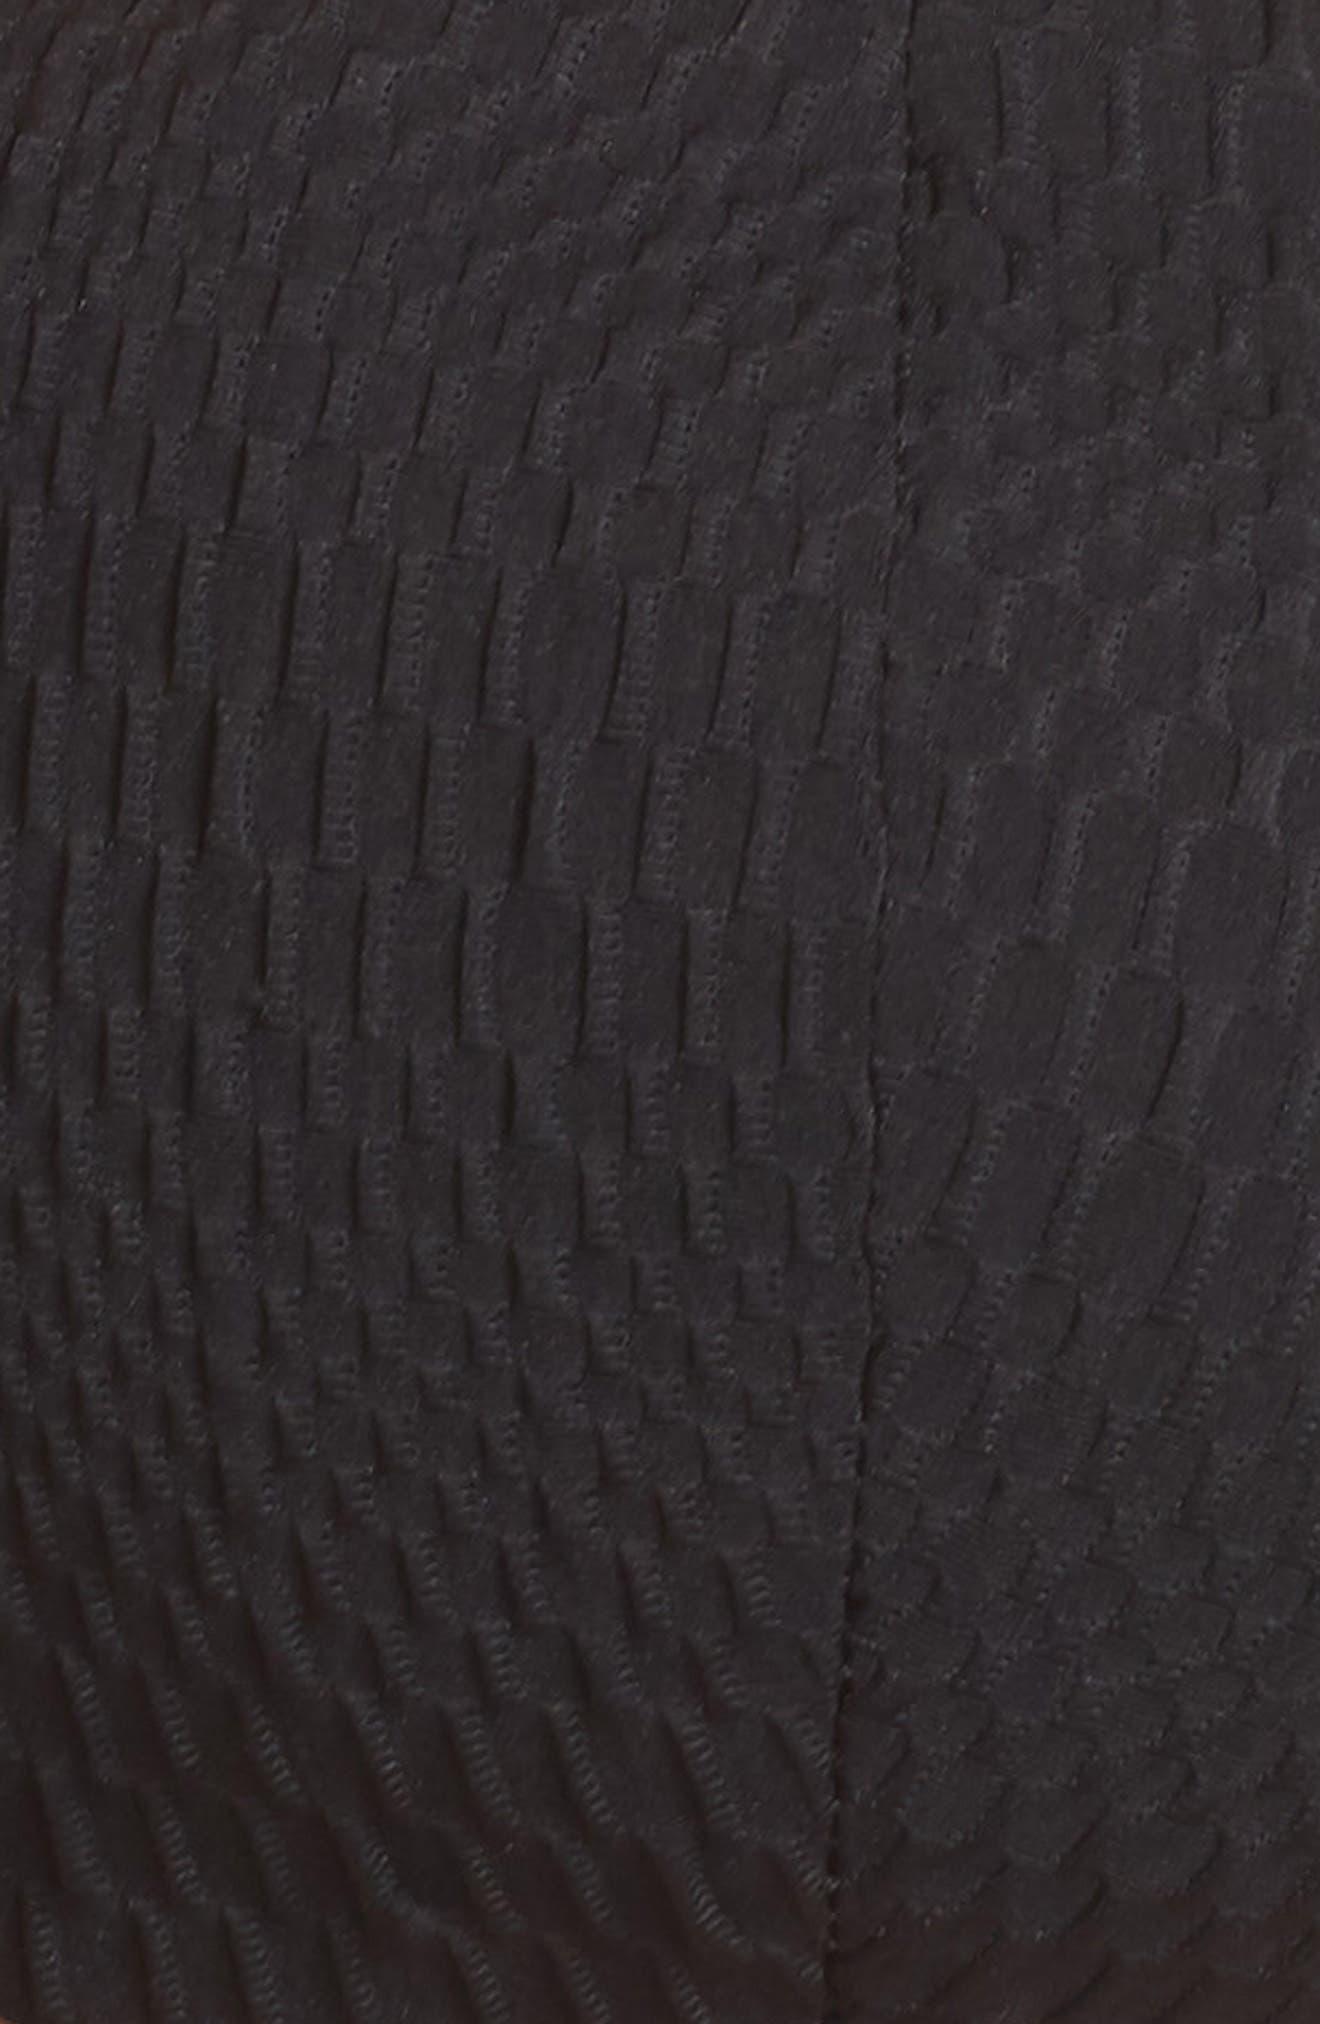 Perla Bandeau Bikini Top,                             Alternate thumbnail 4, color,                             Black